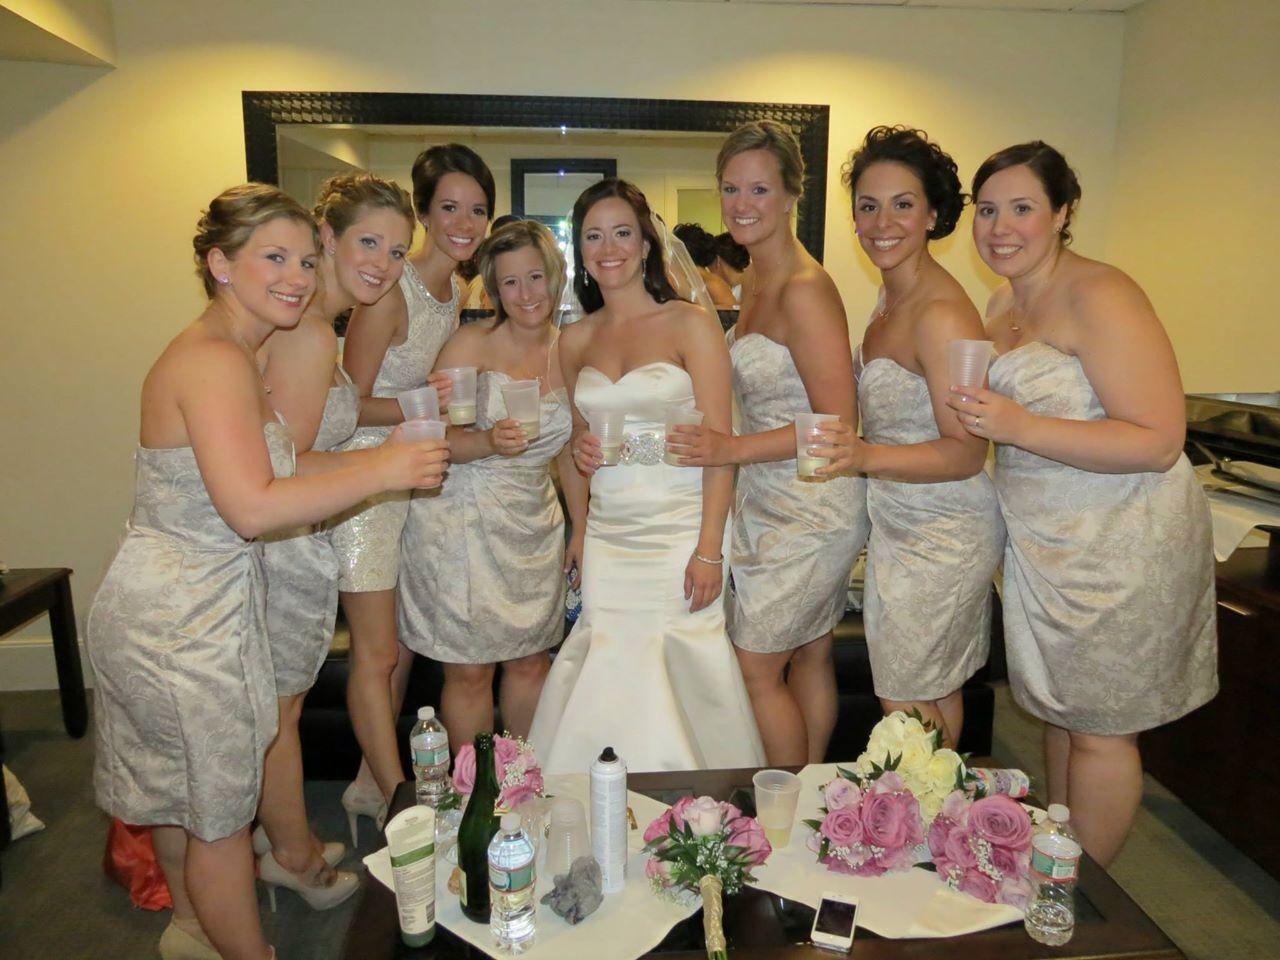 My wedding bridesmaids dresses from davids bridal house of wu my wedding bridesmaids dresses from davids bridal house of wu wedding gown added ombrellifo Gallery